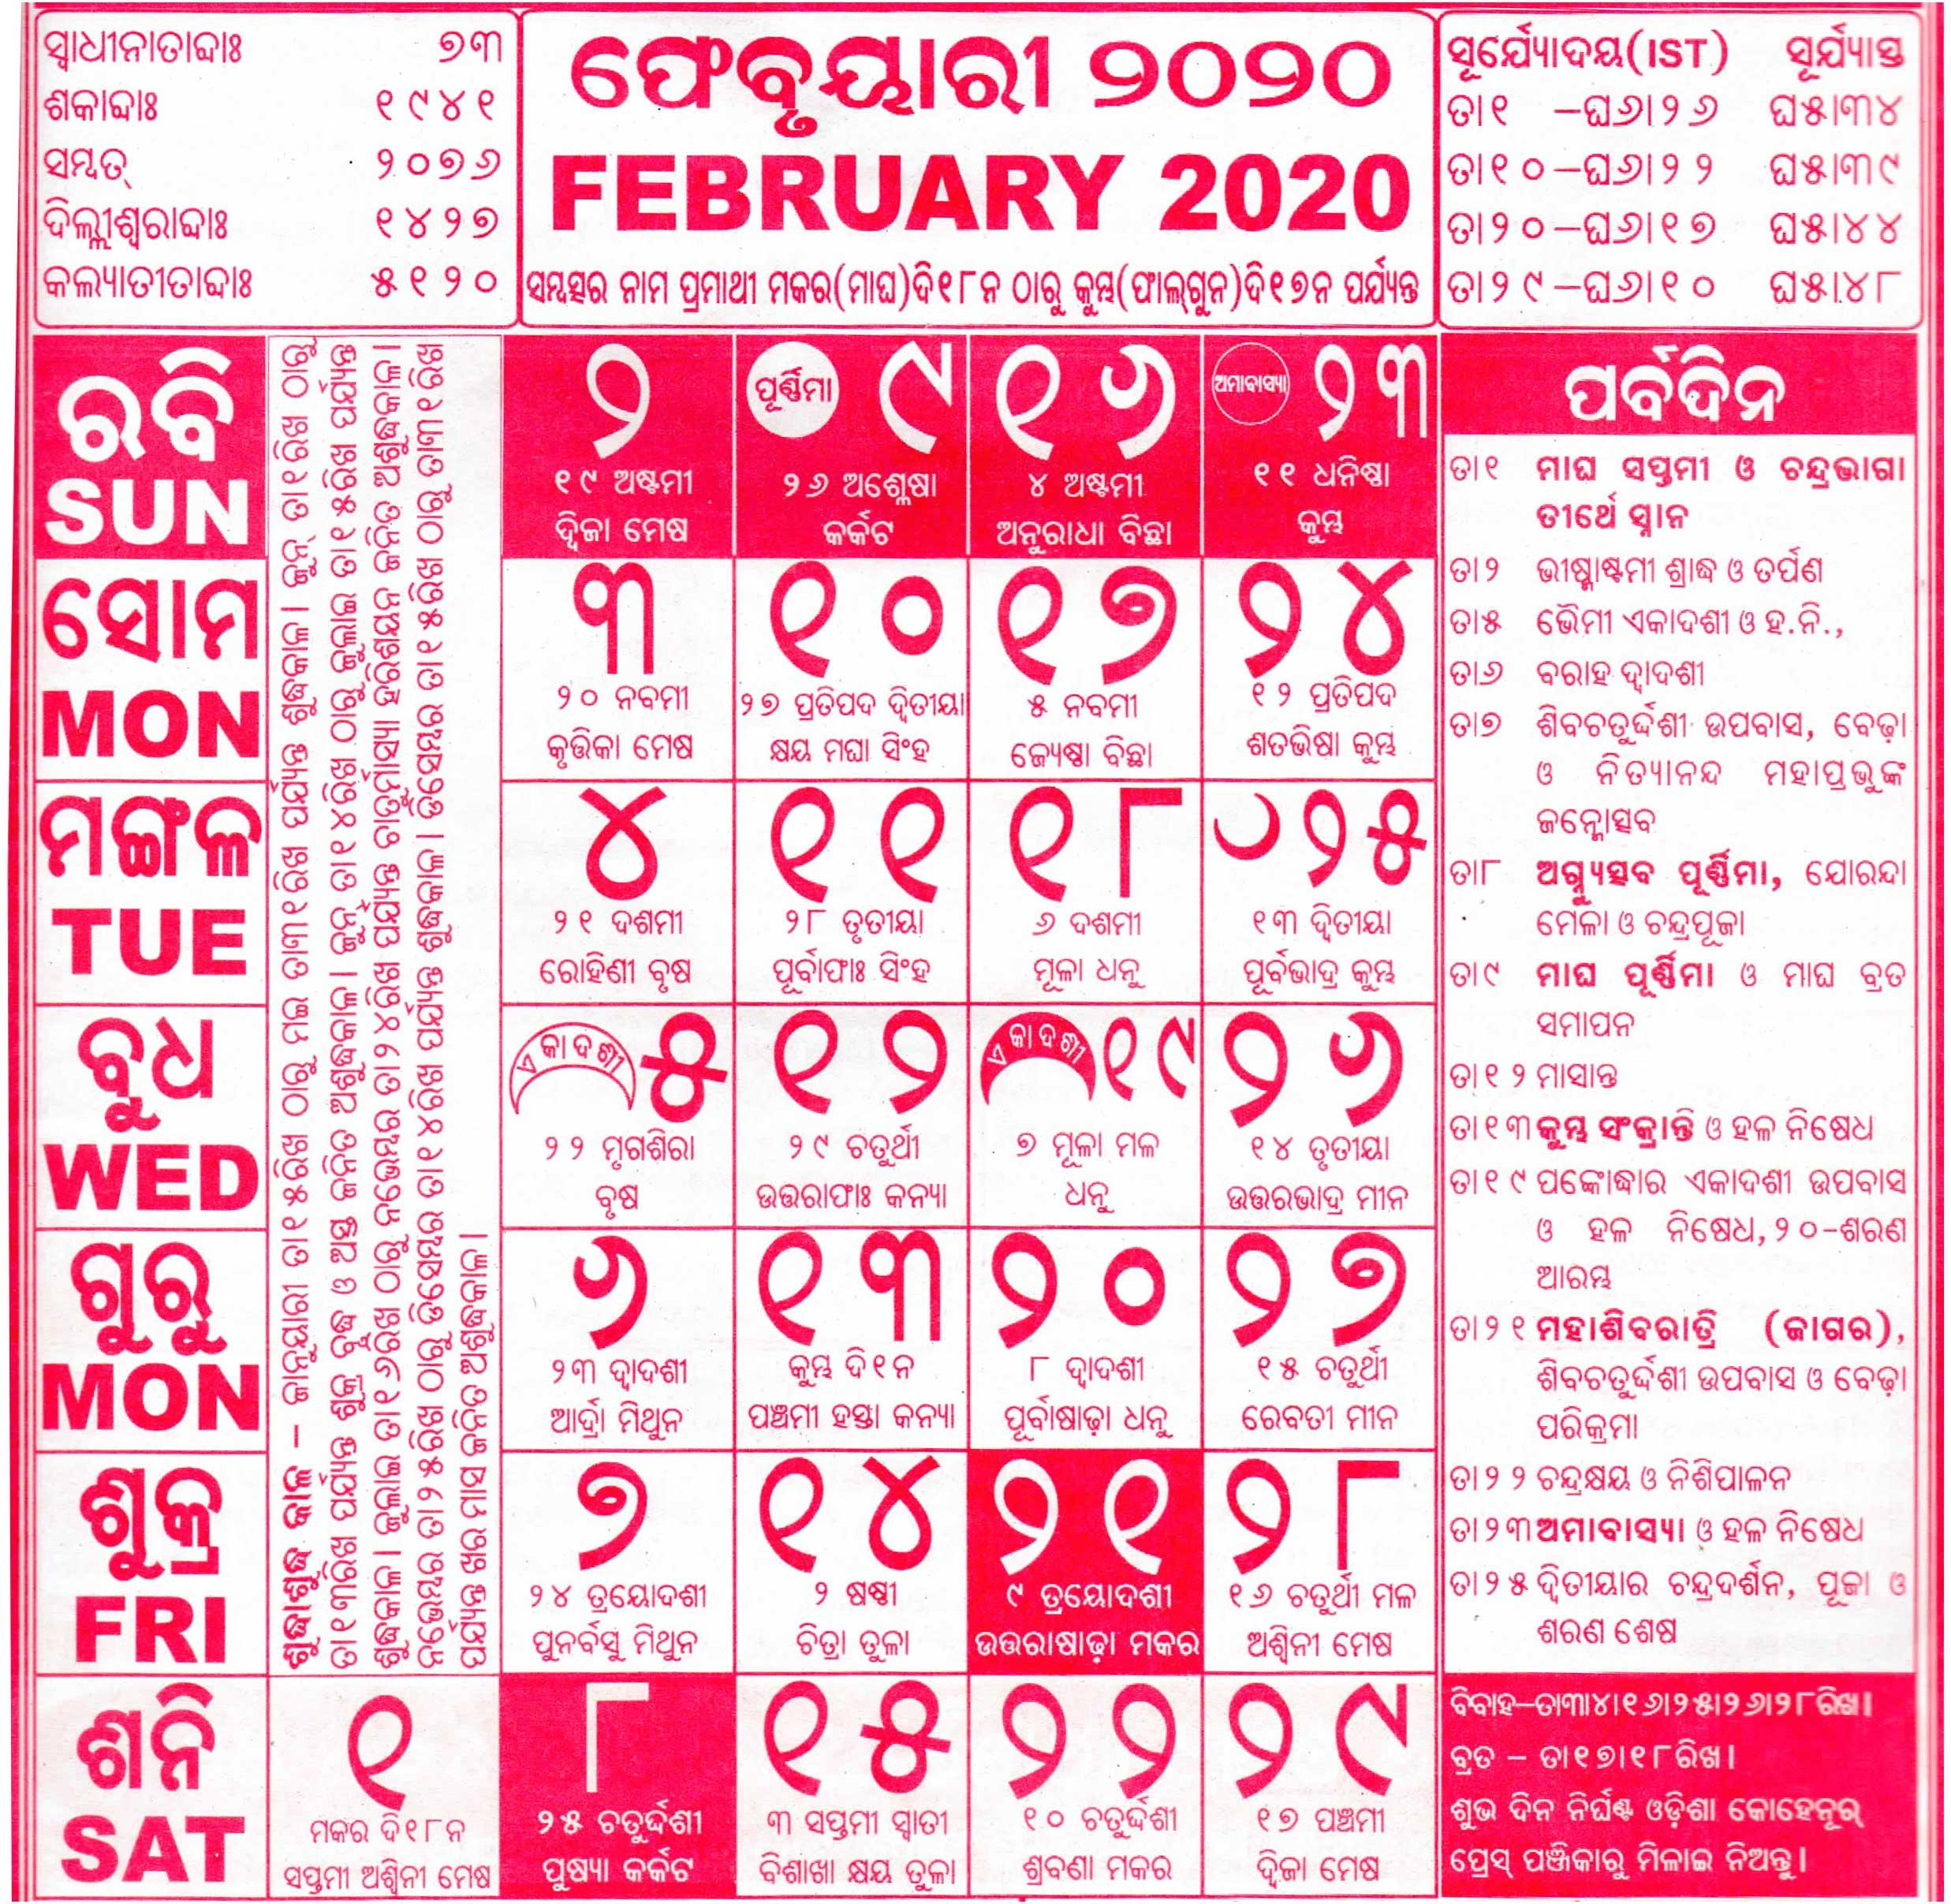 Odia Calendar February 2020 | | Calendarcraft in Oriya Calendar 2020 February